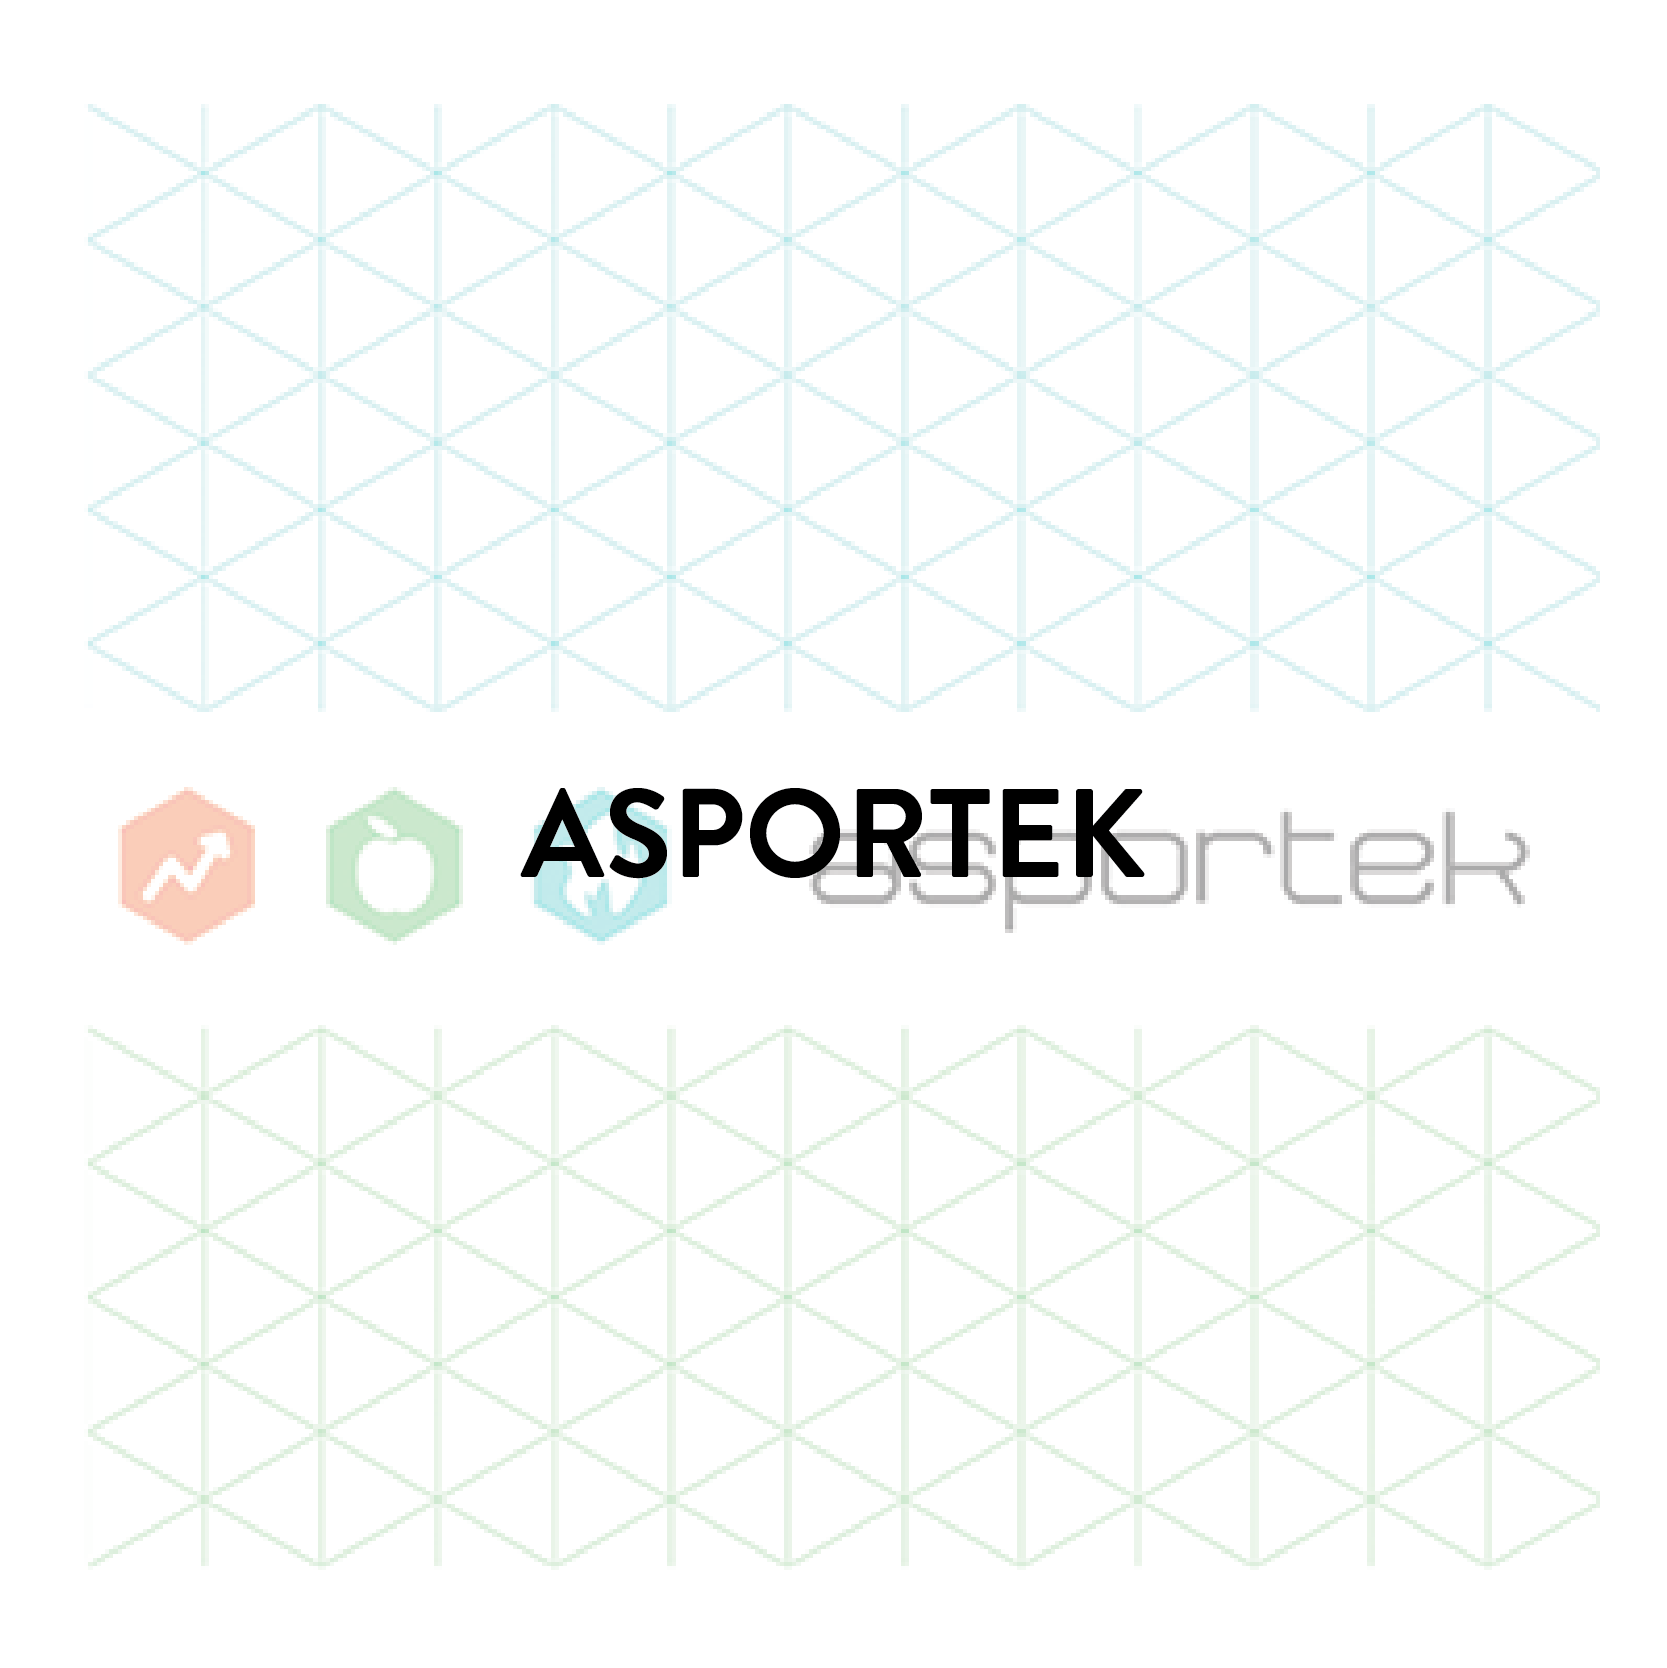 Asportek